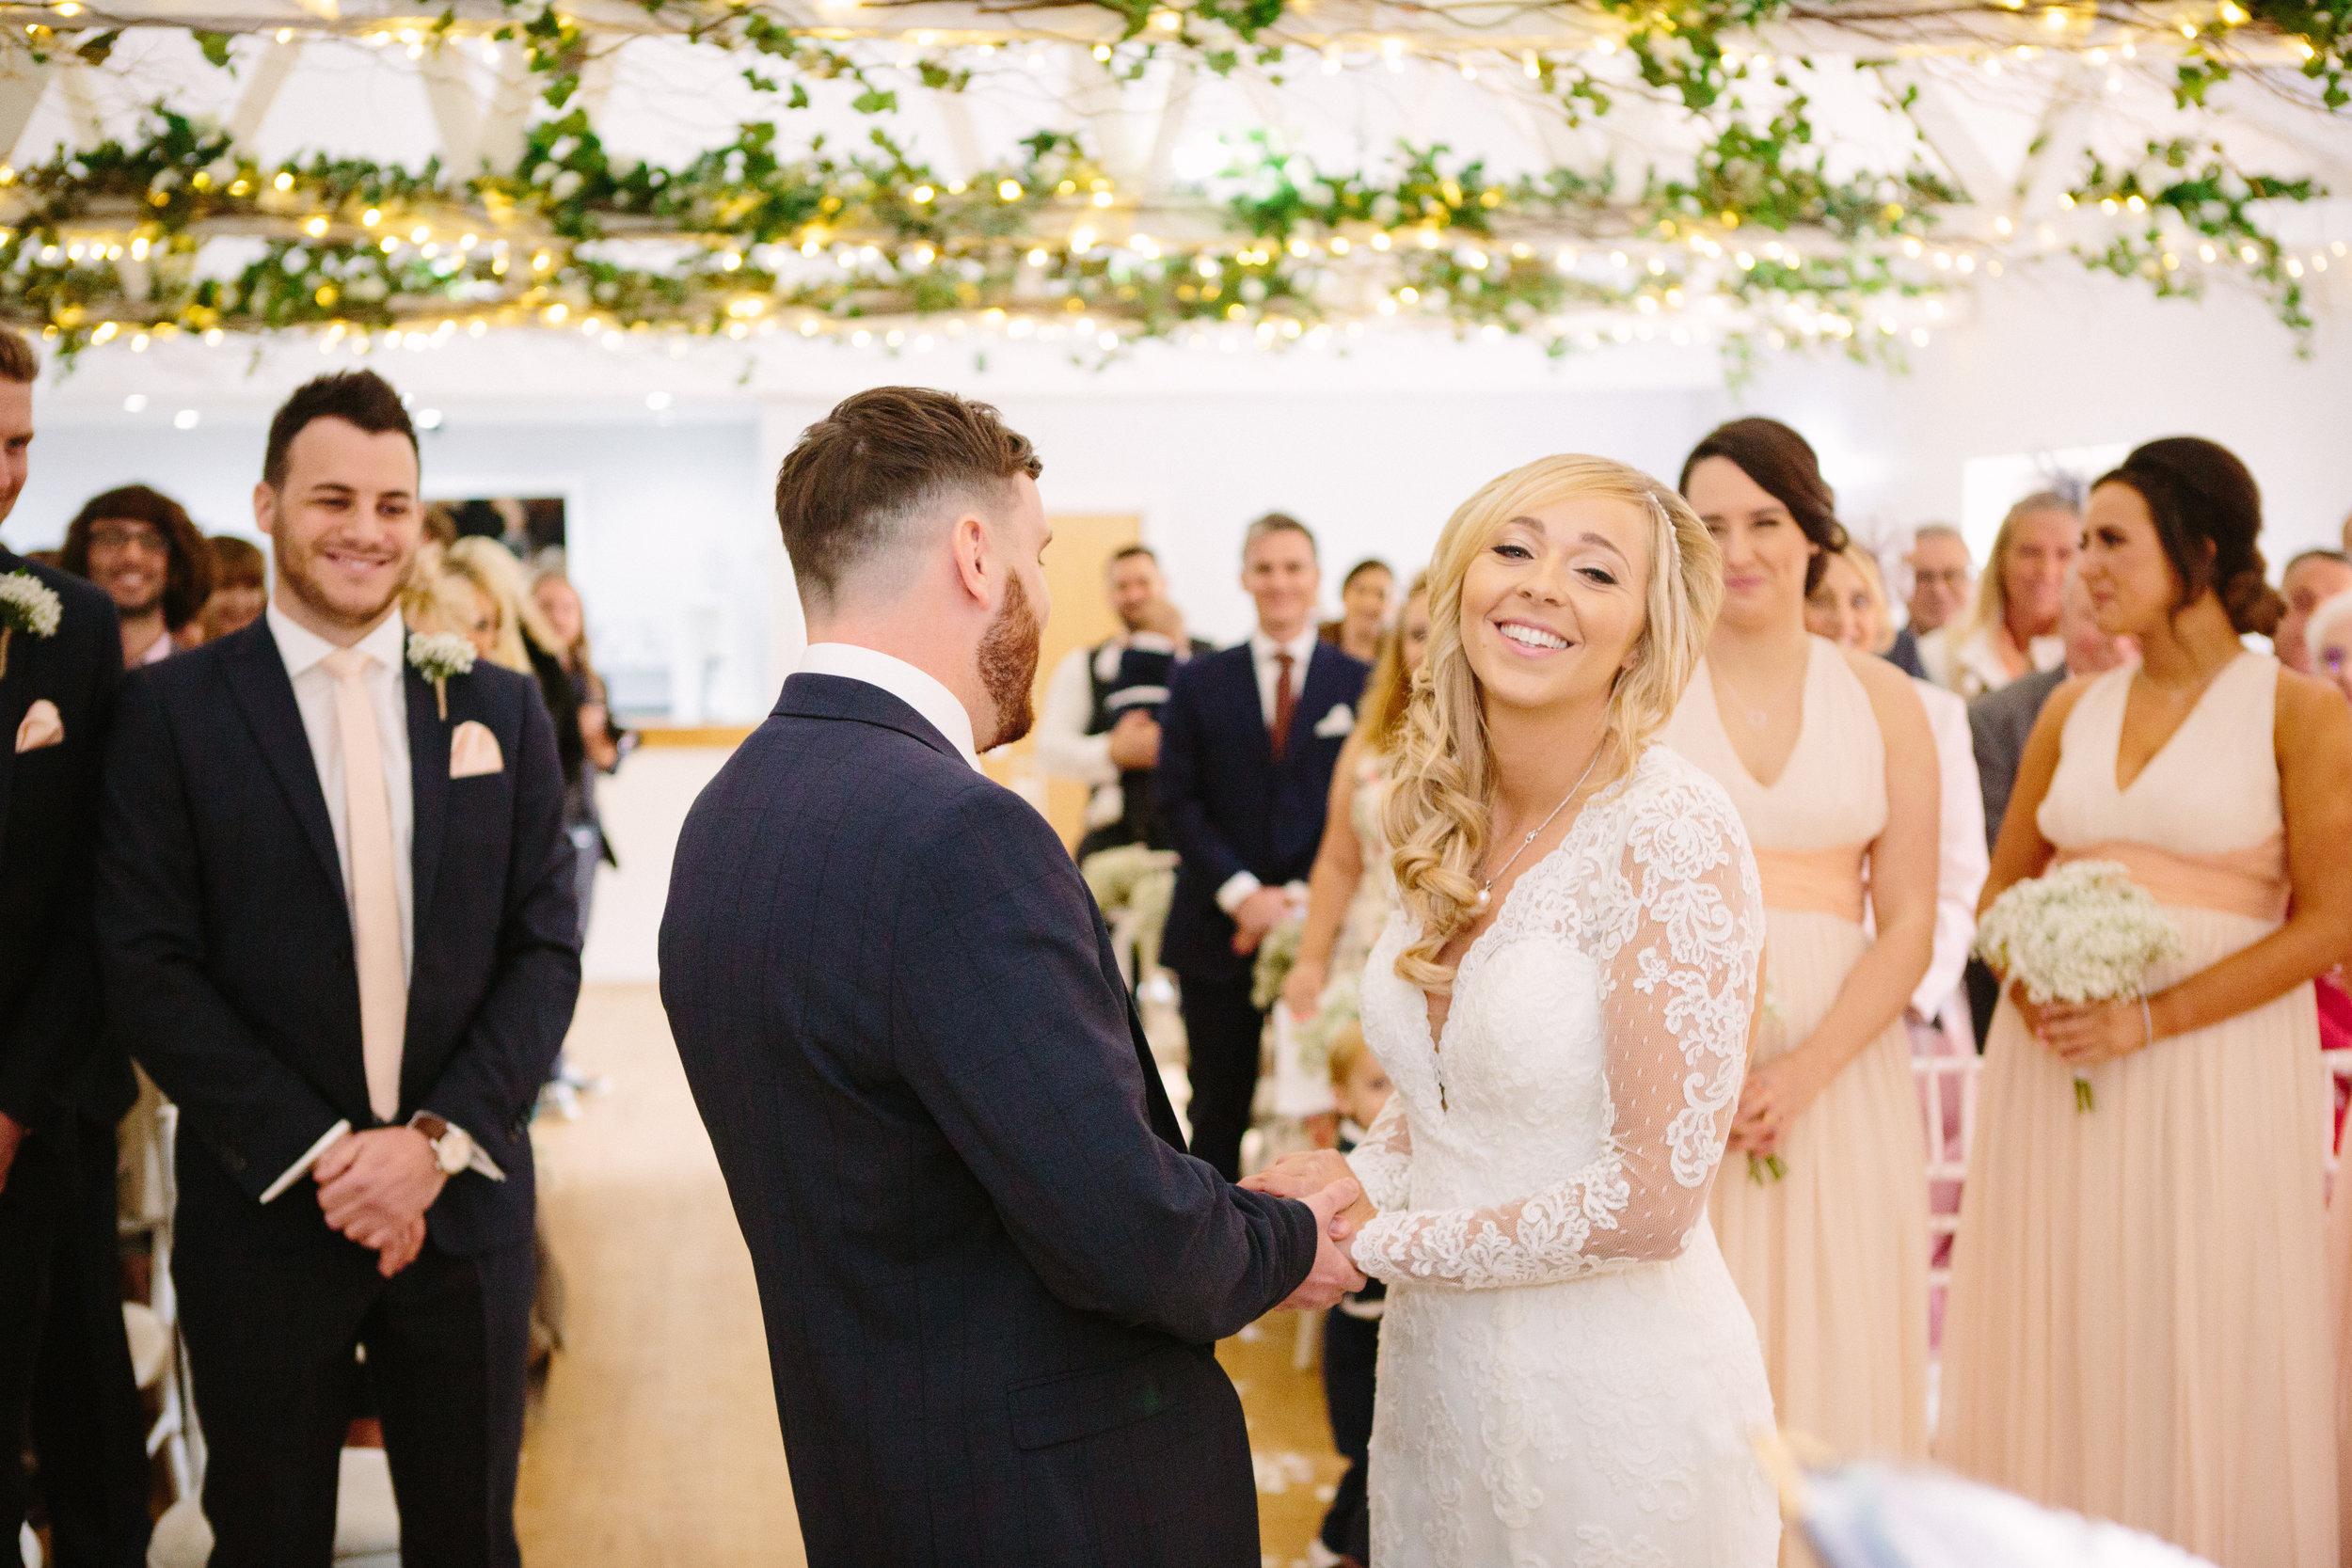 london-hertfordshire-wedding-photography-milling-barn-ceremony-38